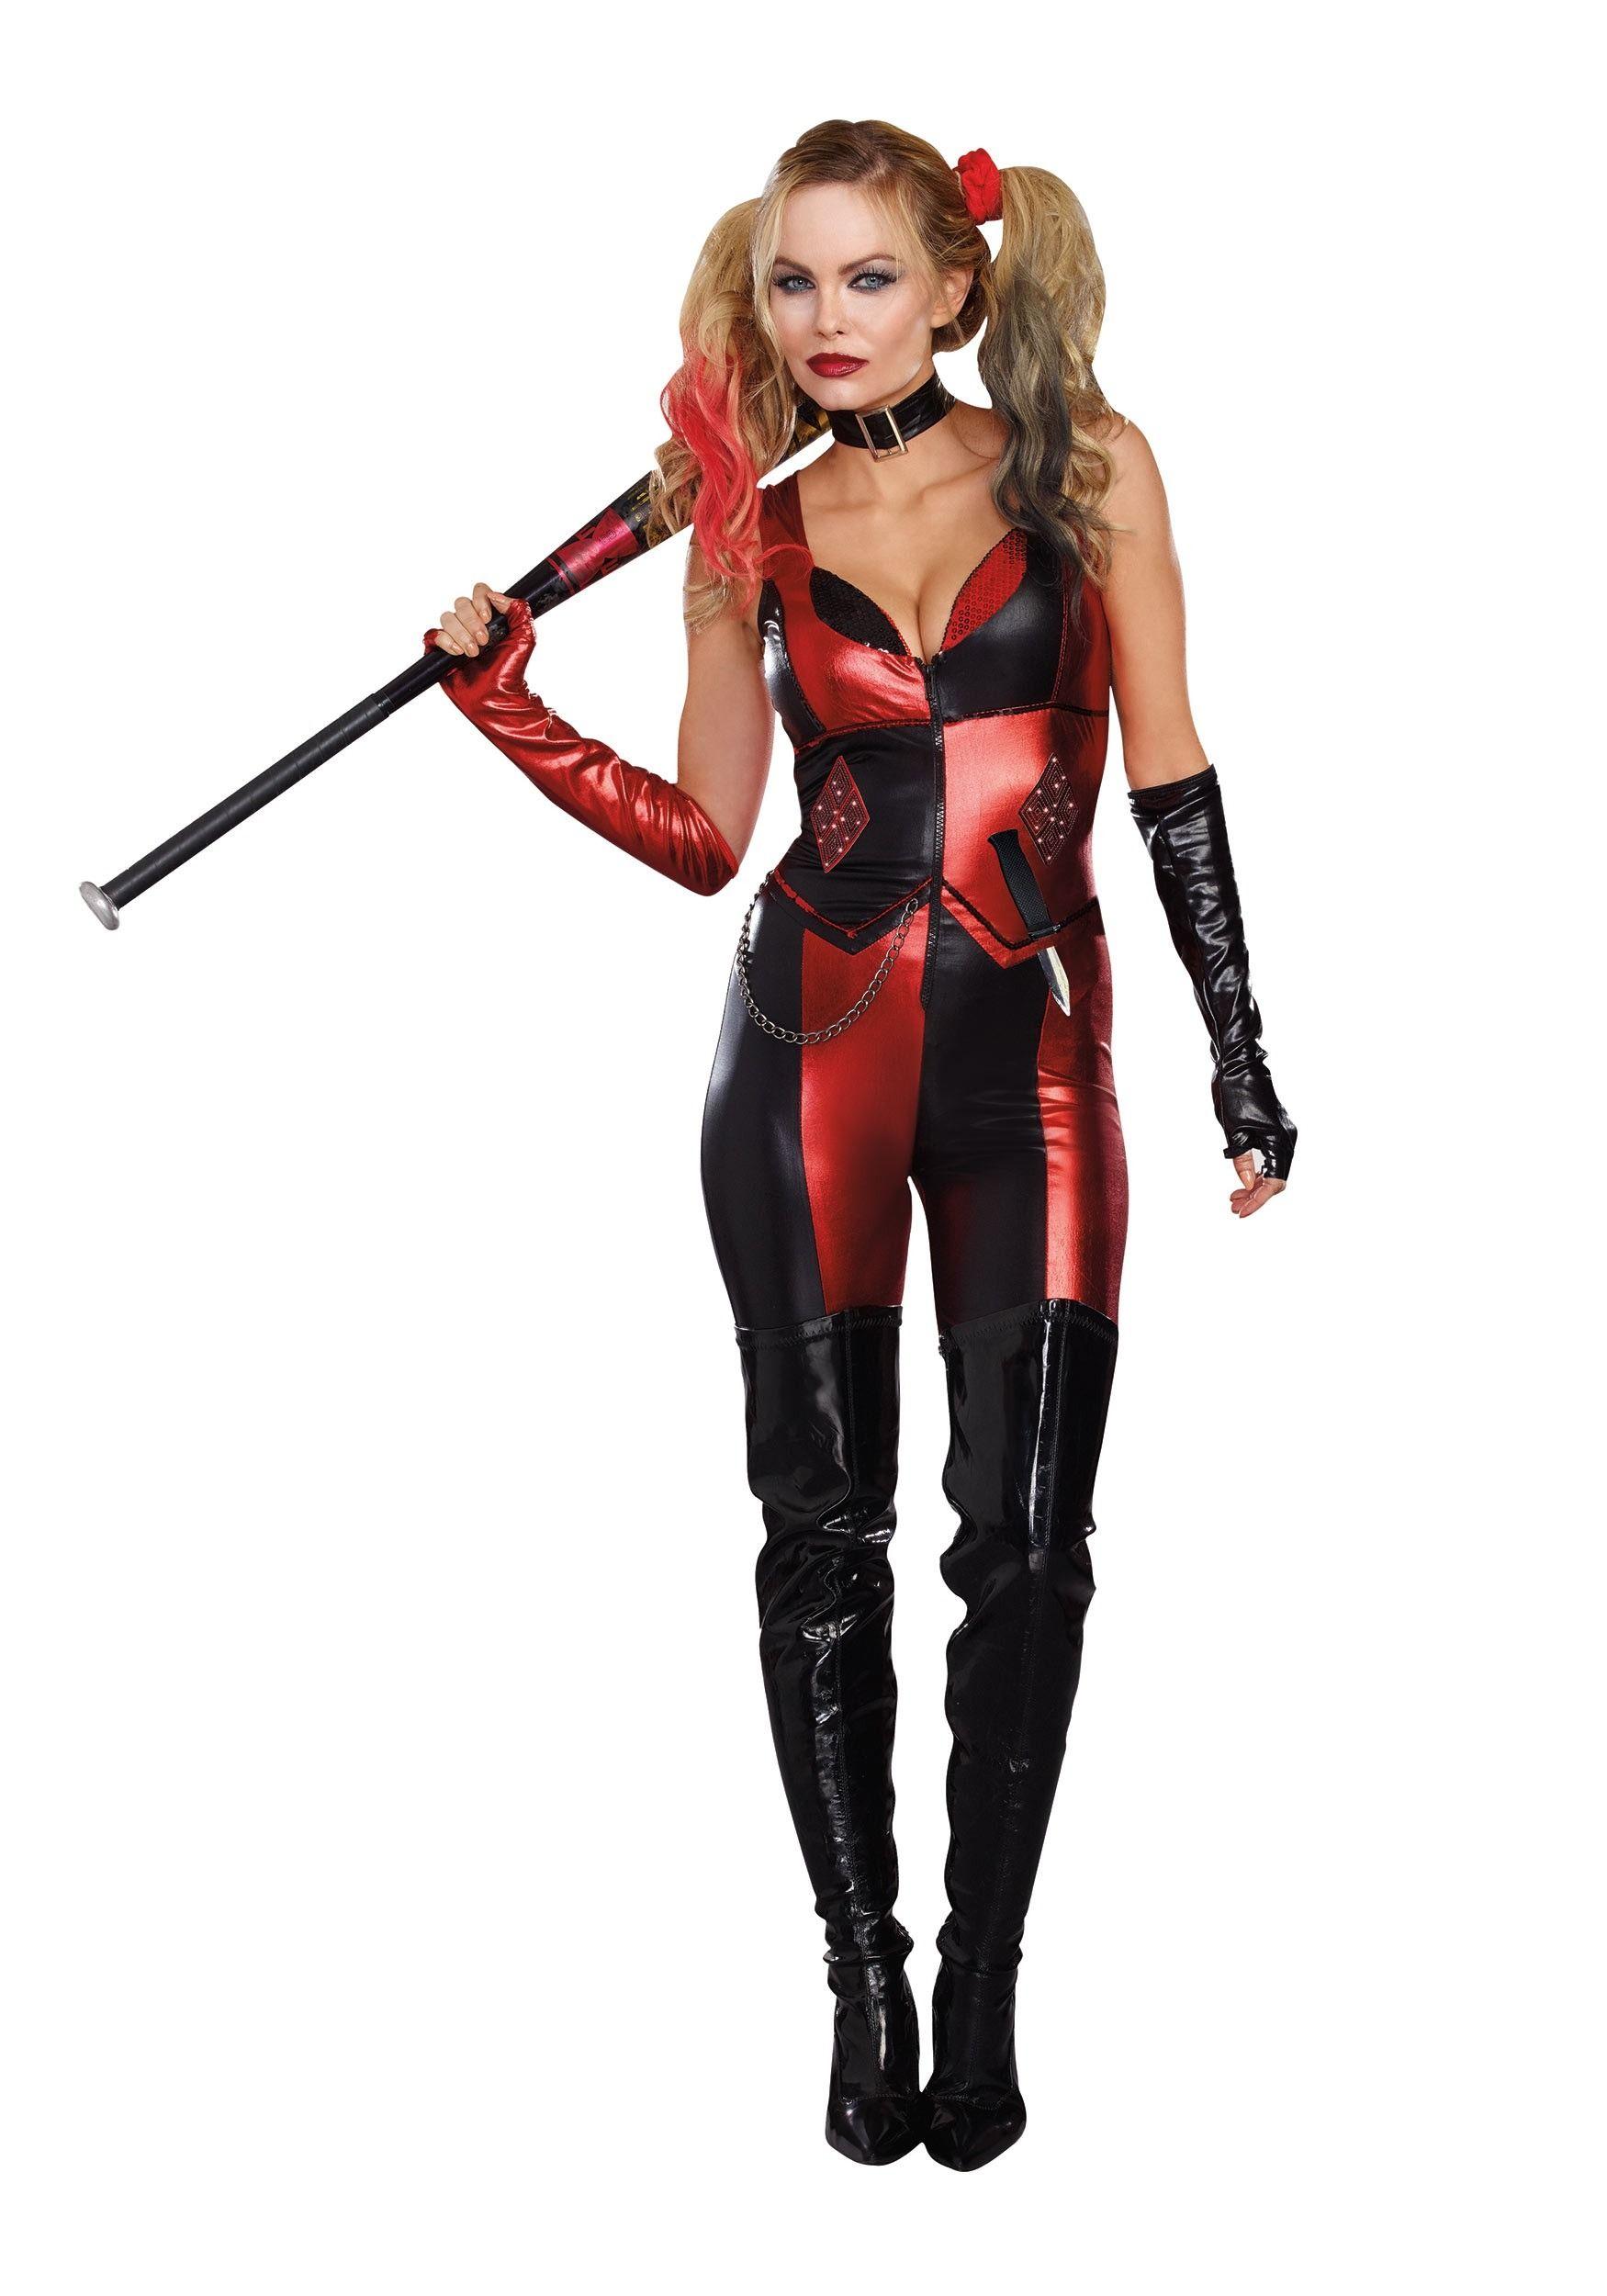 7bd6bc545c69 Harlequin Blaster Costume | Cosplay | Harlequin costume, Halloween ...